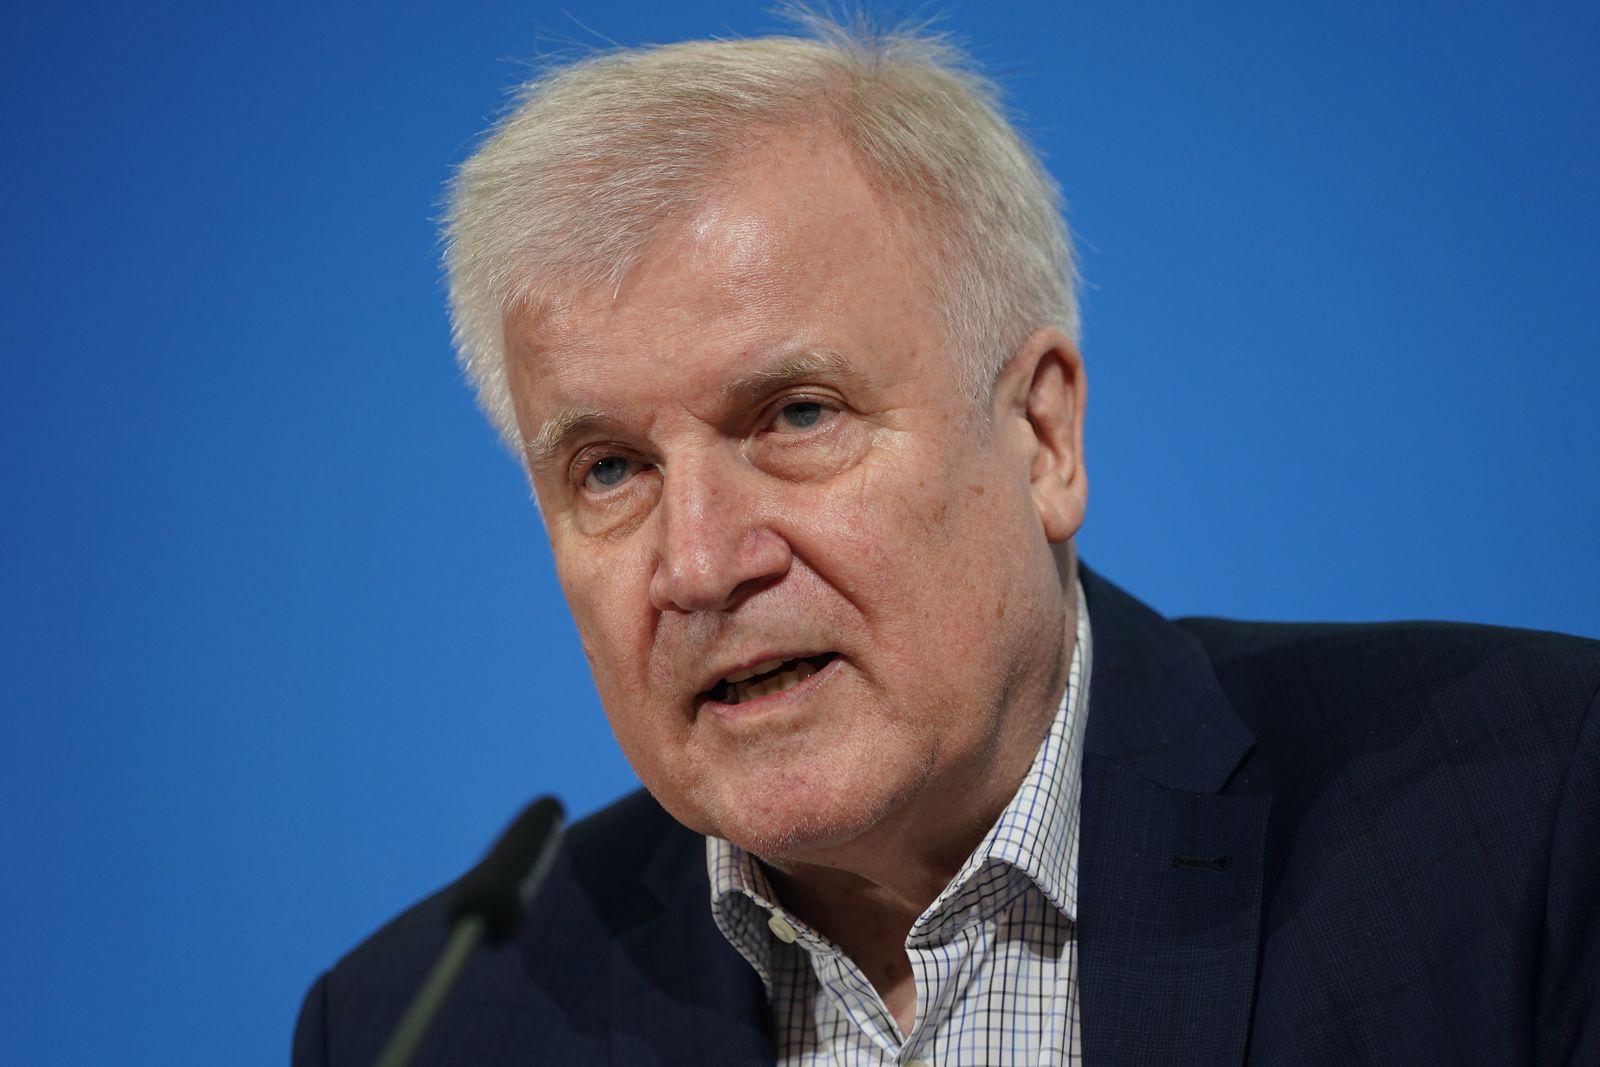 Interior Minister Seehofer Announces New Measures To Counter Coronavirus Spread